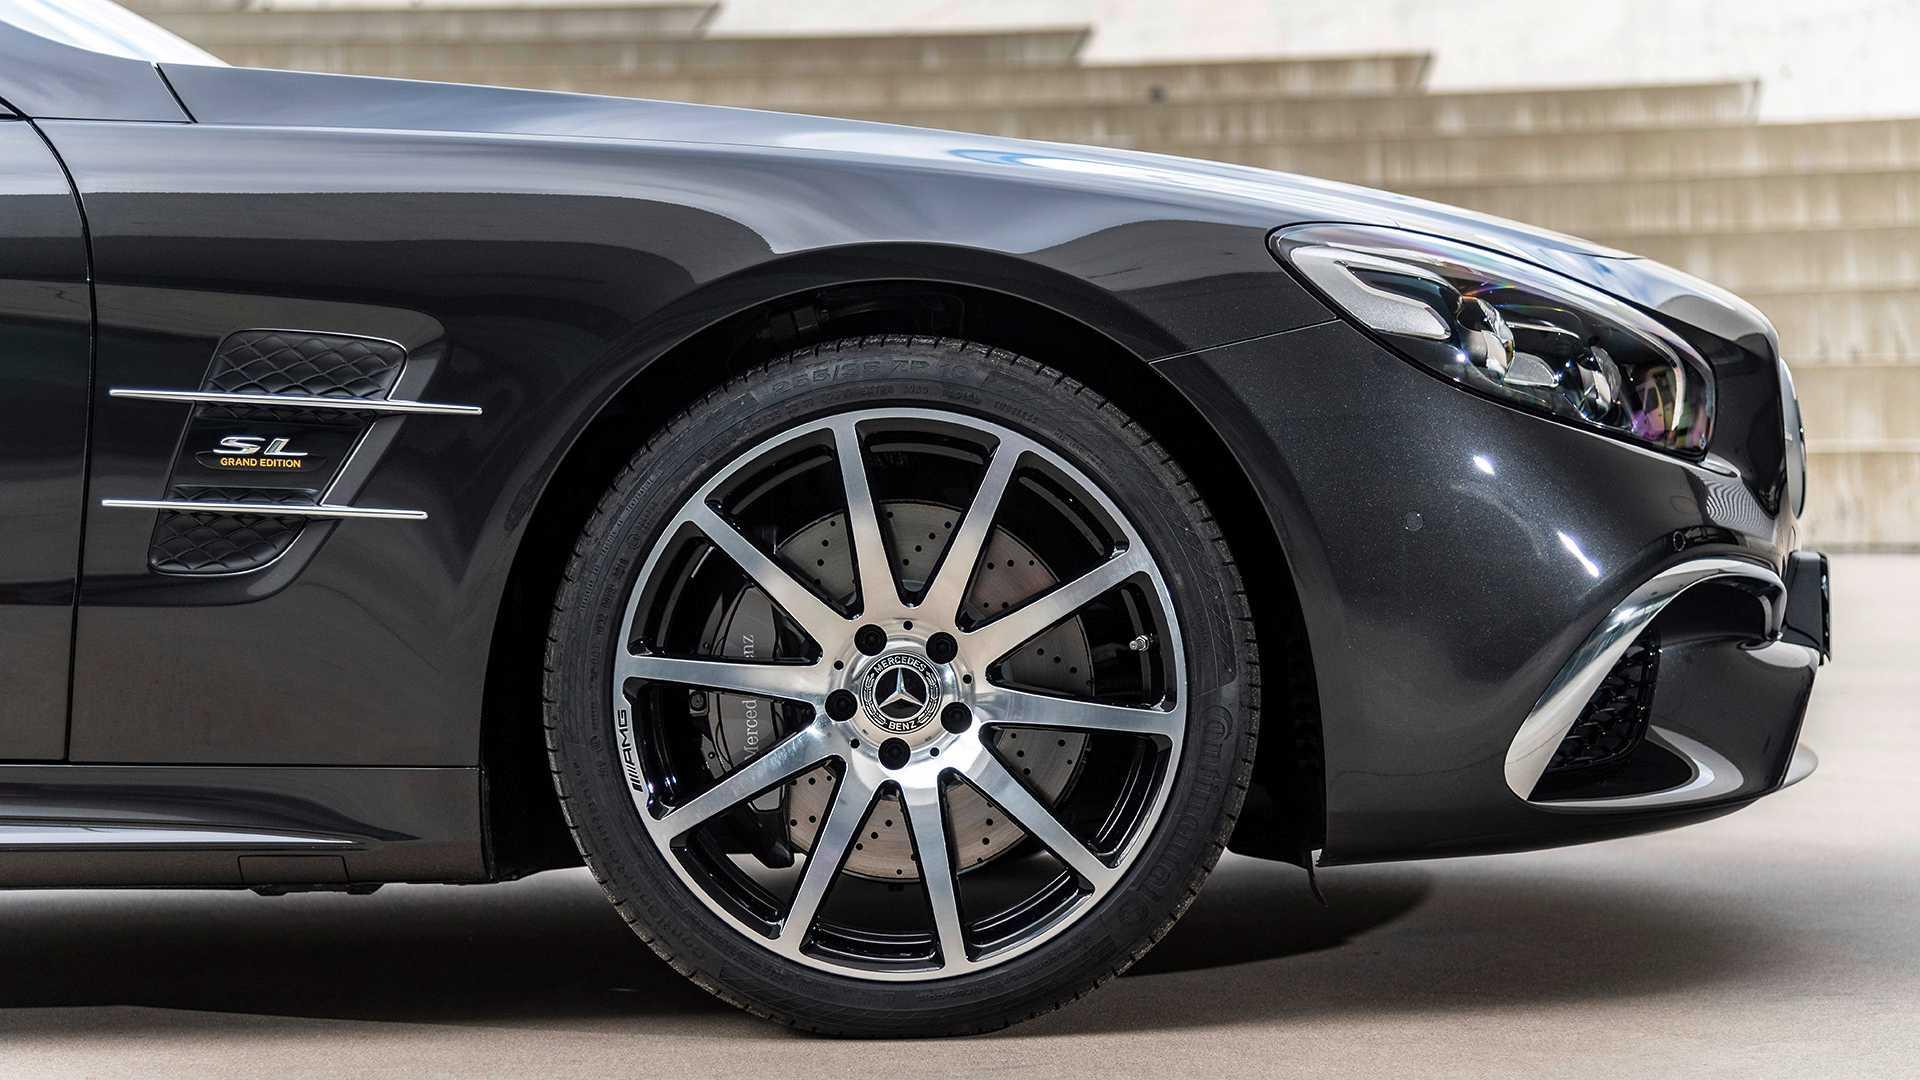 2020 Mercedes-Benz SL 500 Grand Edition (Color: Graphite Grey) Wheel Wallpapers (7)